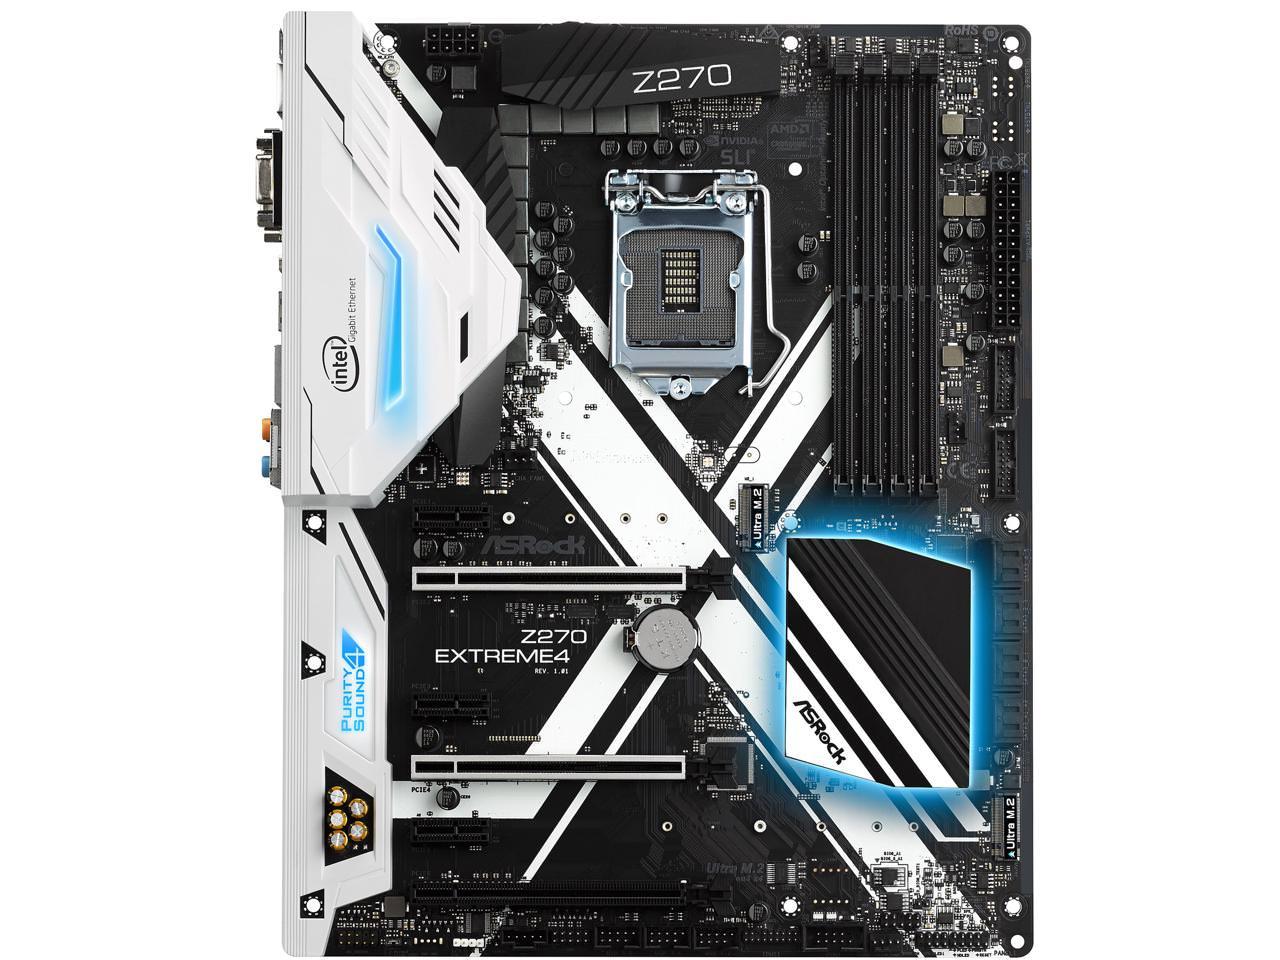 ASRock Z270 Extreme 4 LGA 1151 Intel Z270 Motherboard - $104.99 AR